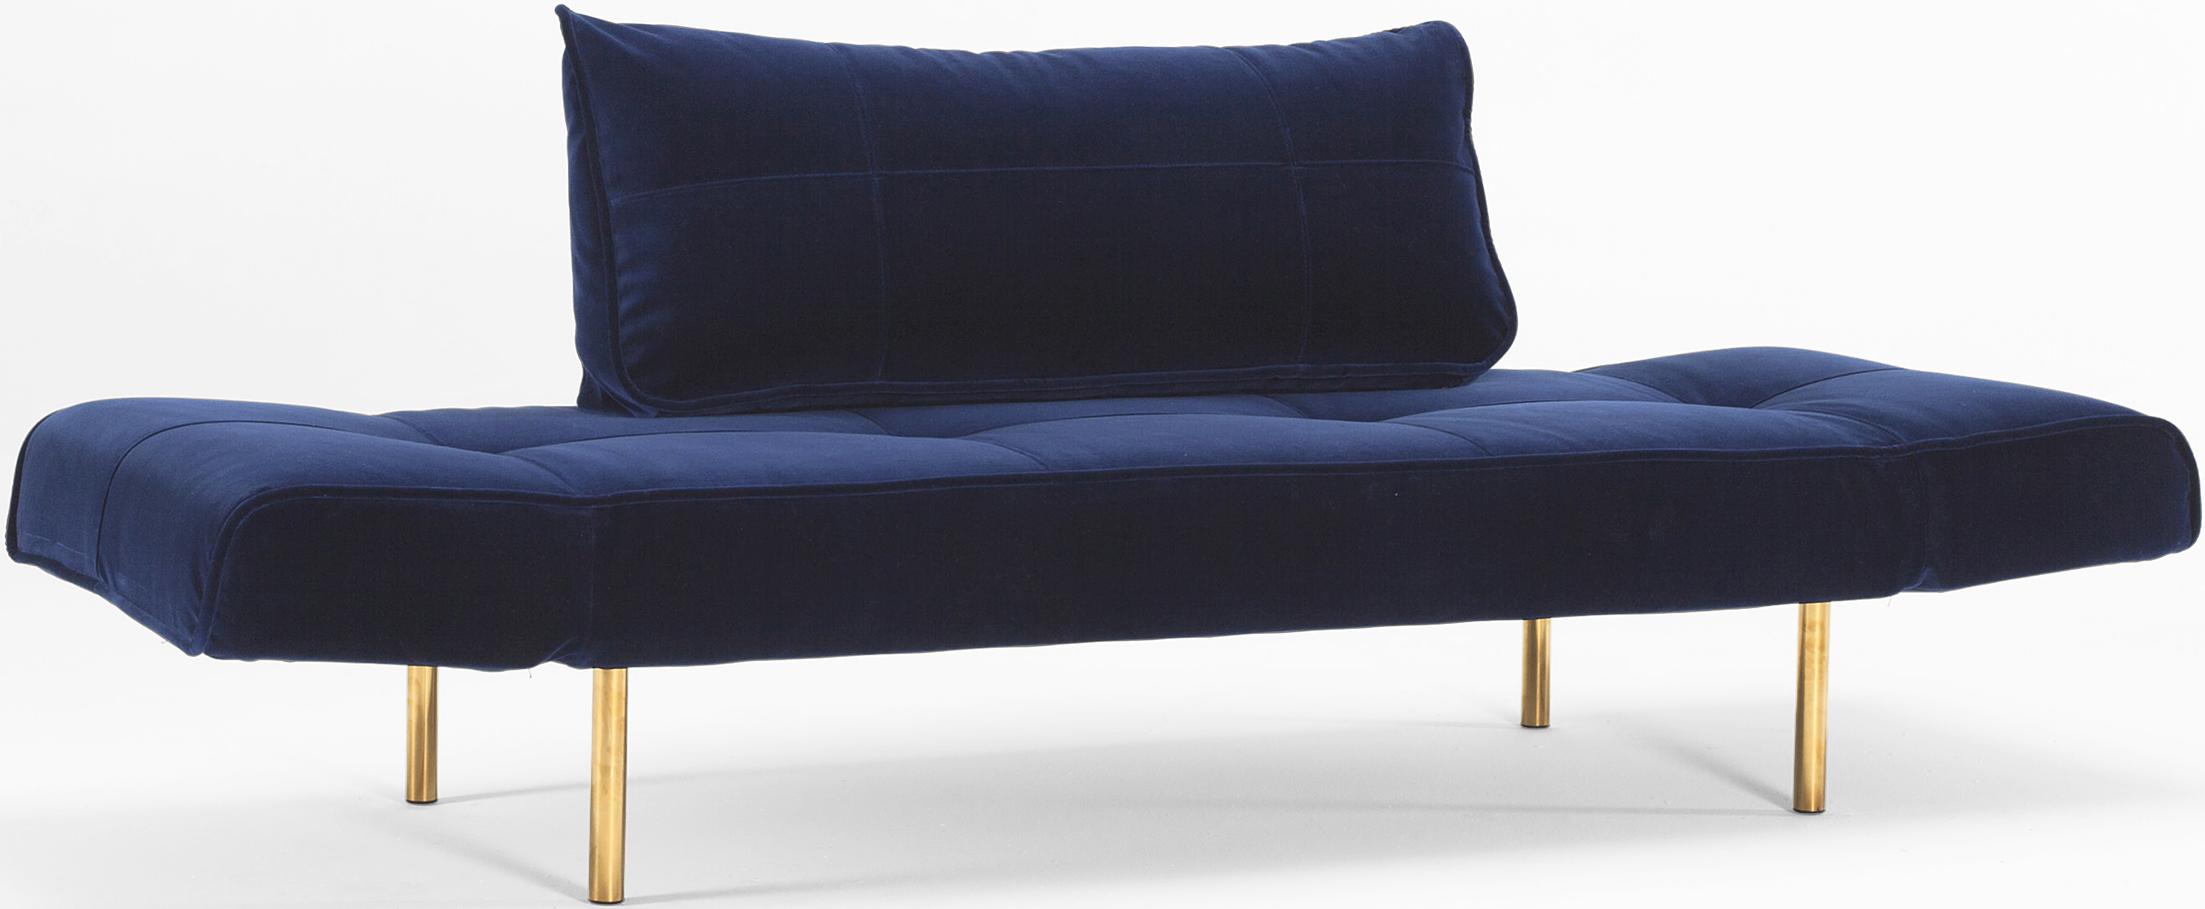 daybed zeal velvet blue